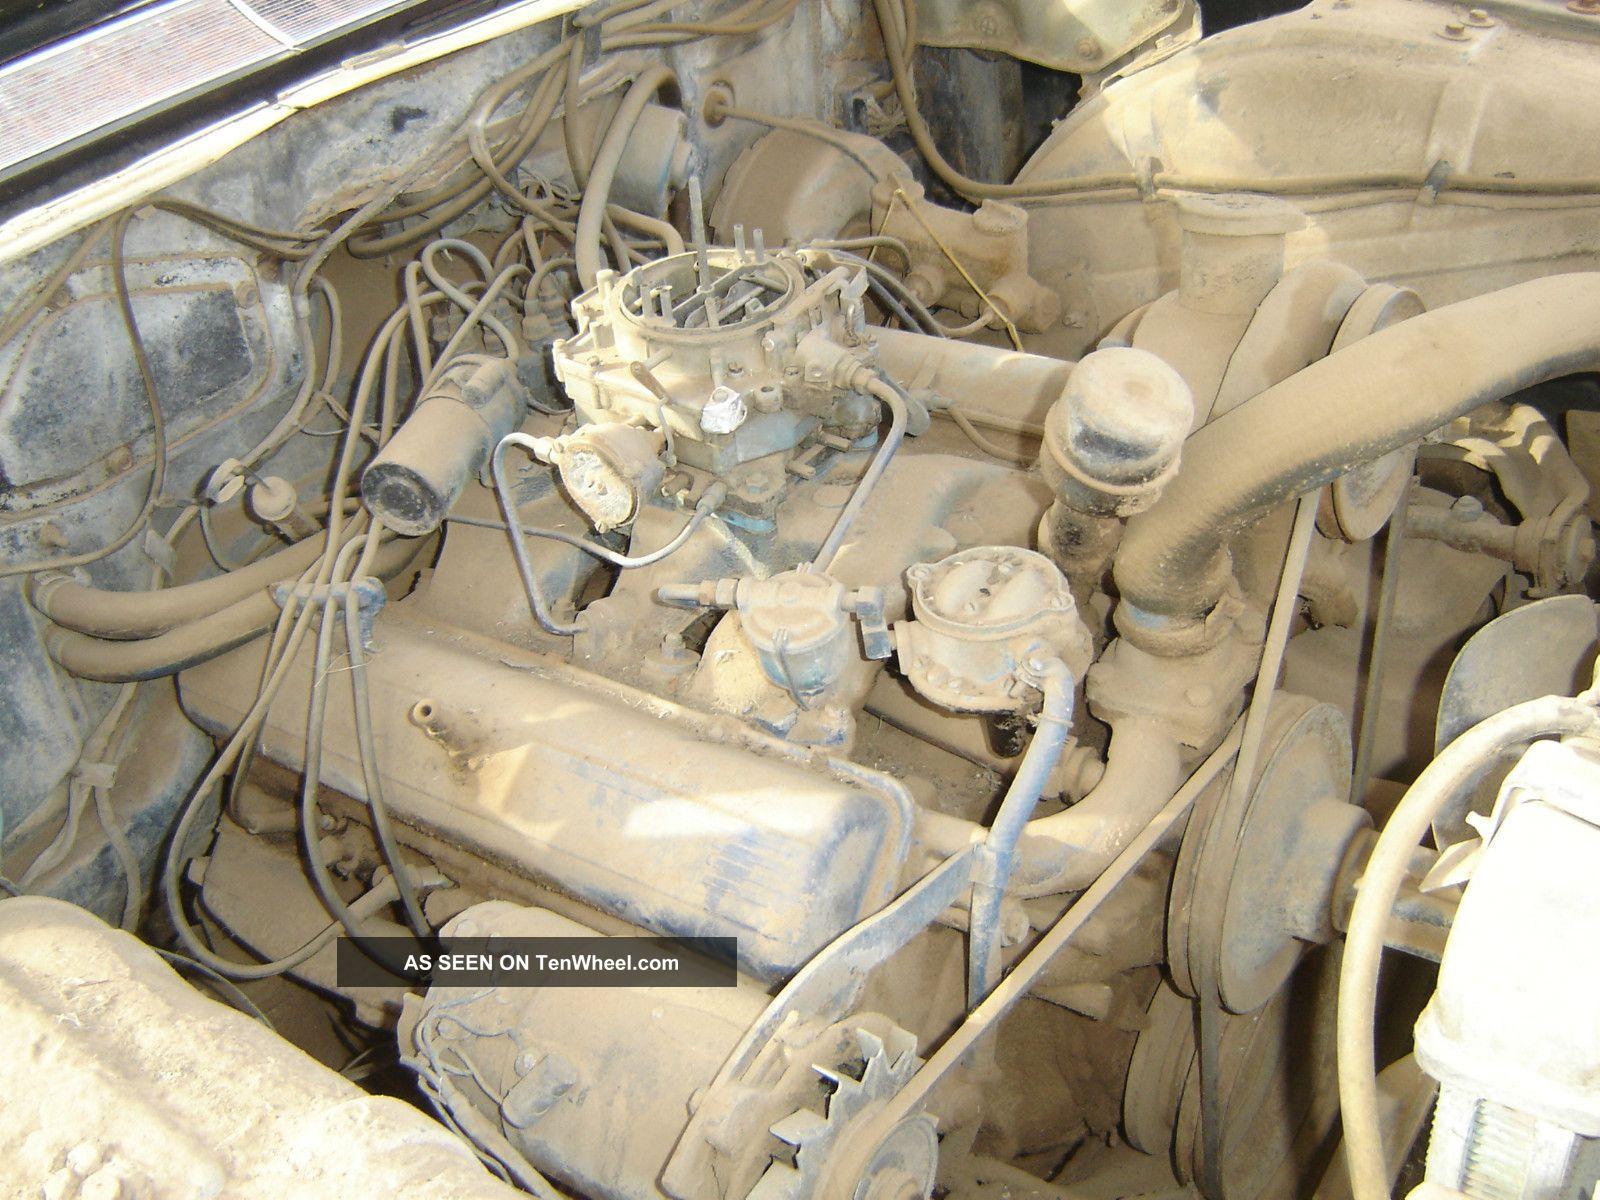 1962 Cadillac Wiring